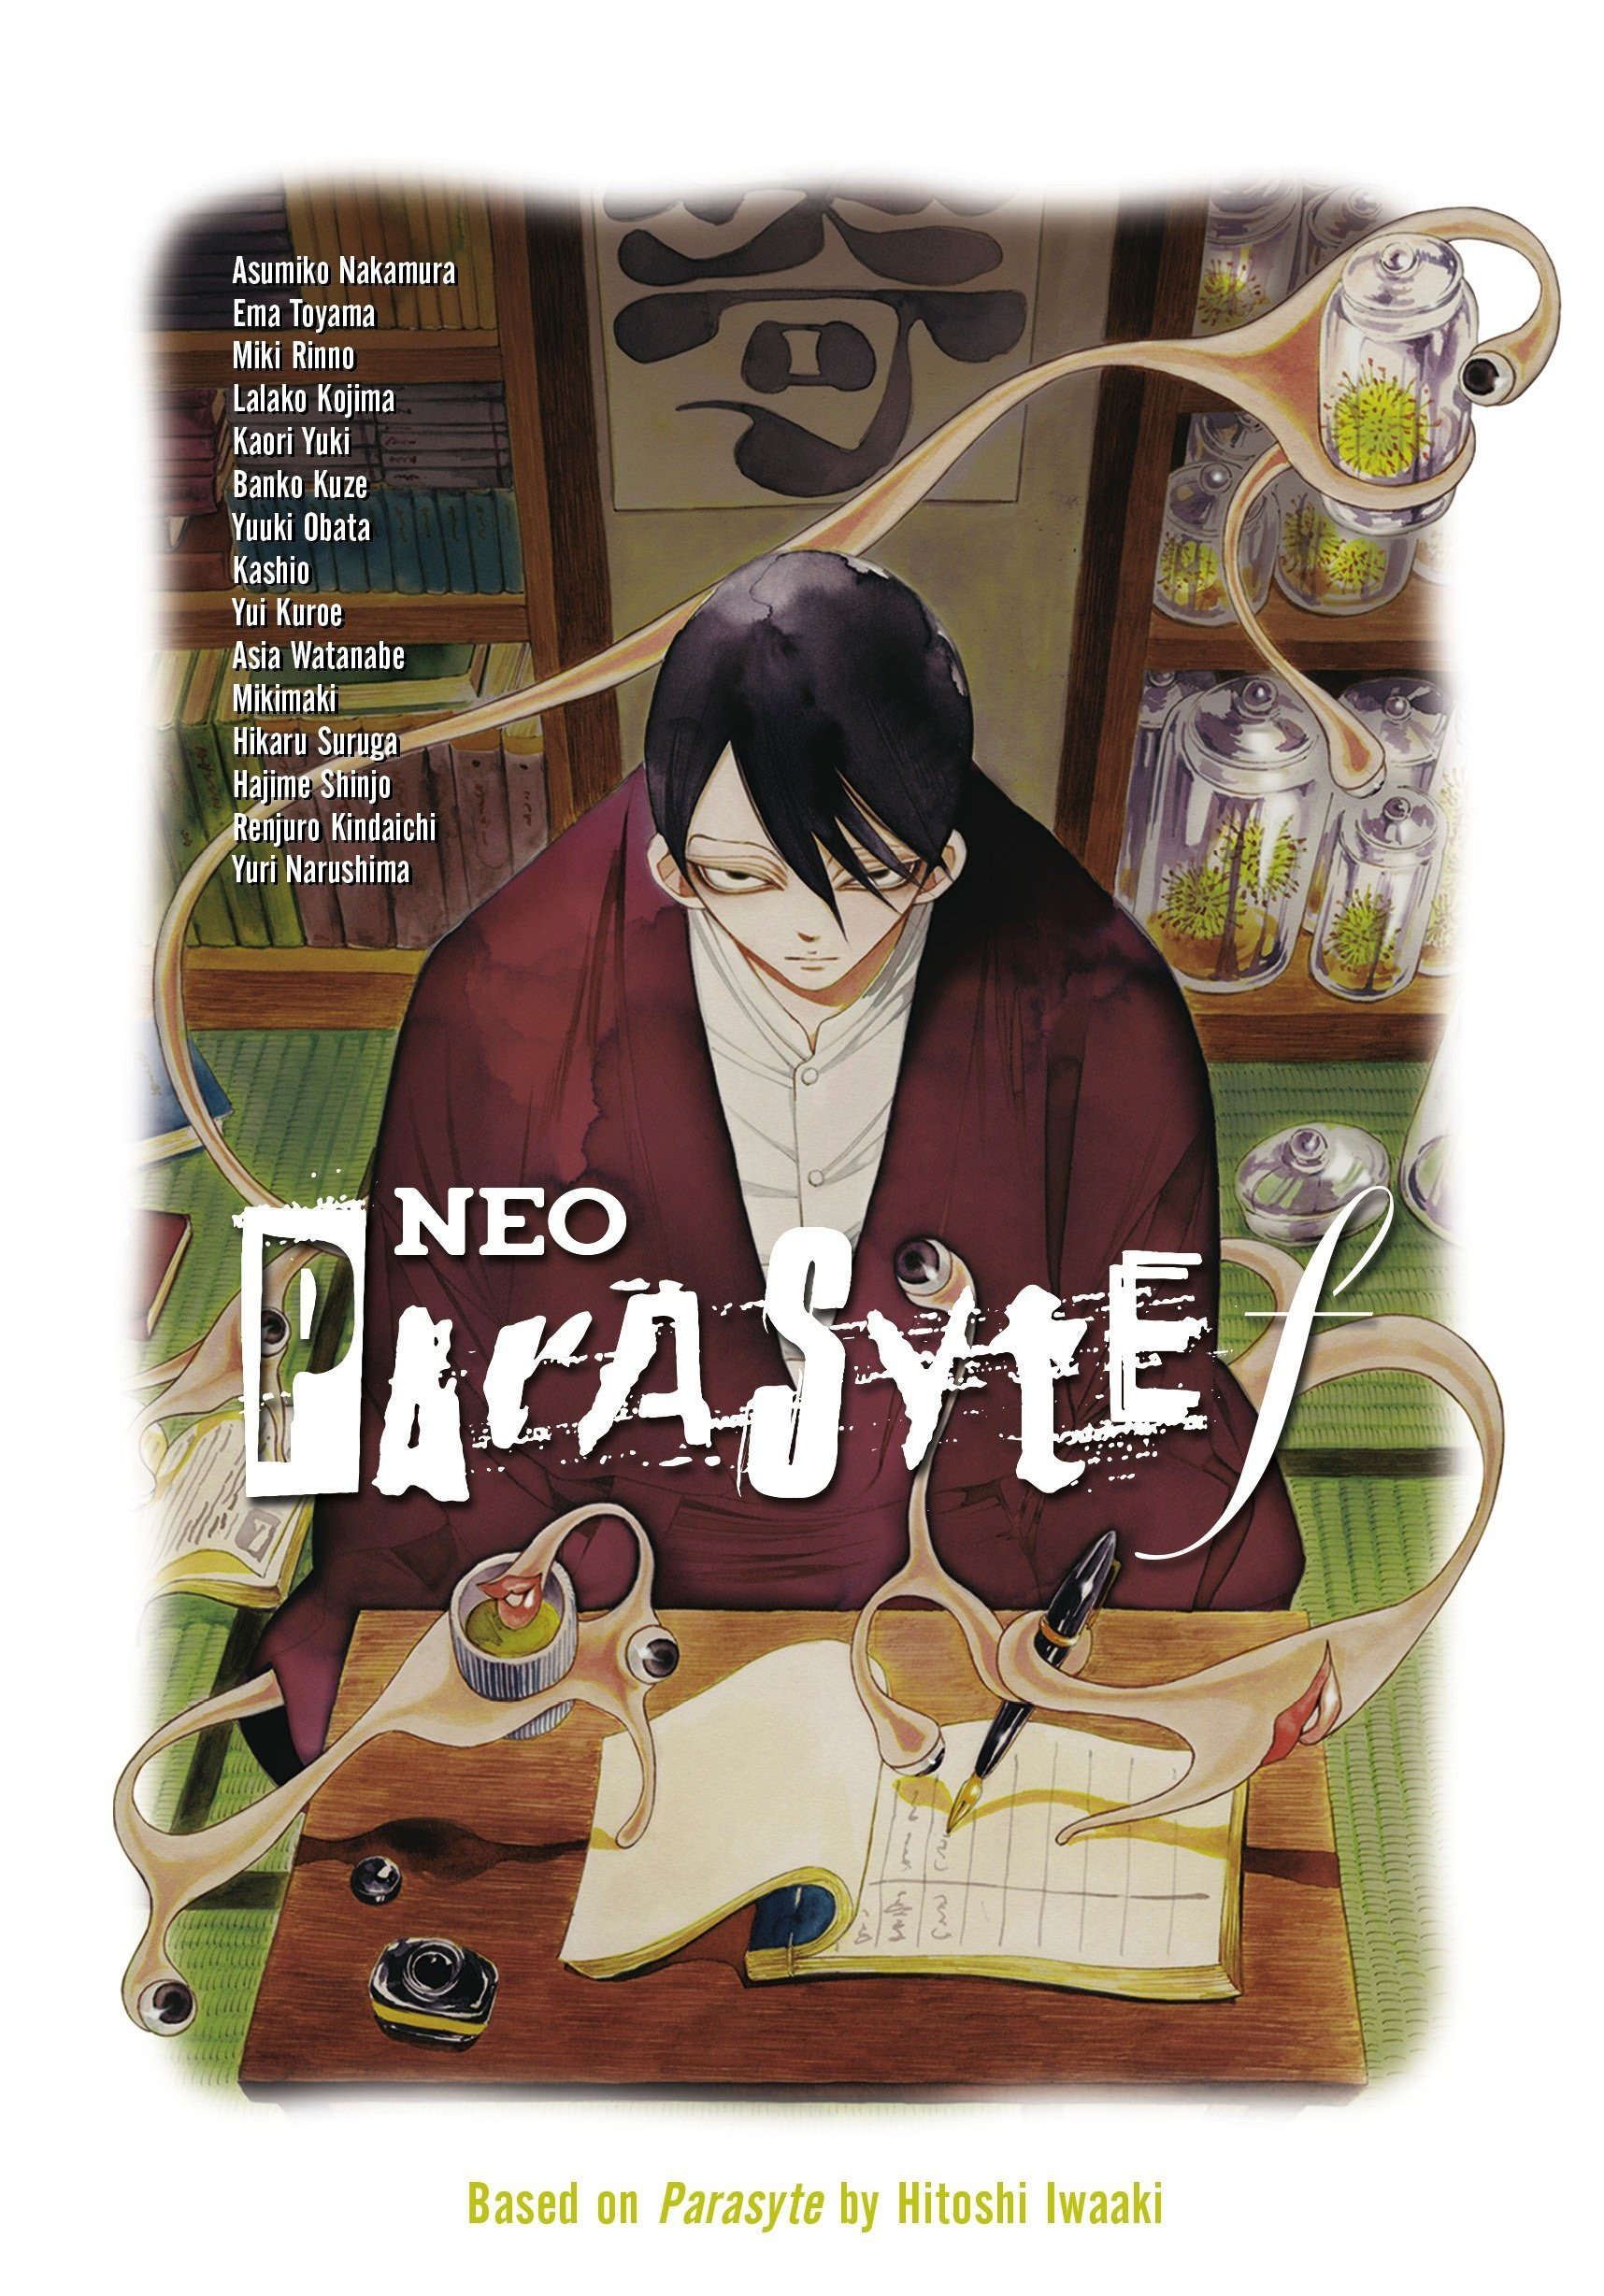 Neo Parasyte f by Kodansha Comics